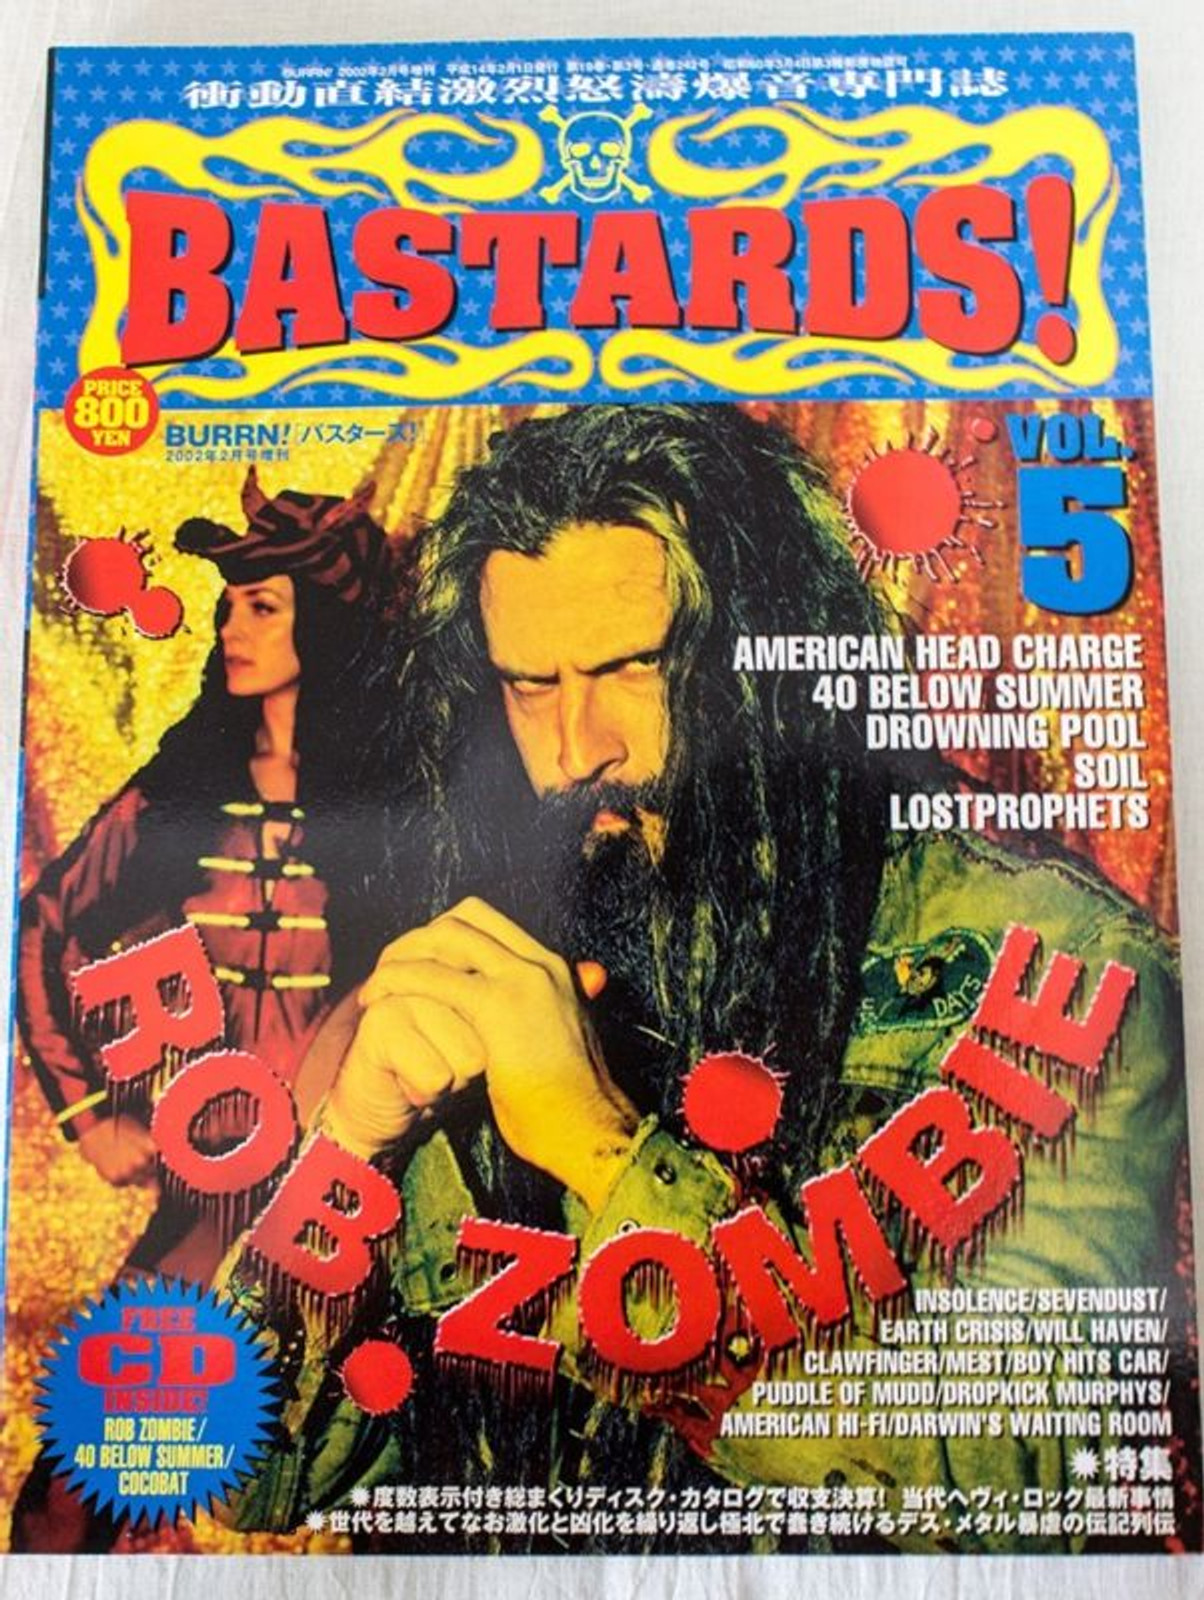 2002 Vol.5 BASTARDS! BURRN! Japan Magazine ROB ZOMBIE/LOSTPROPHETS/SOIL/WHITE